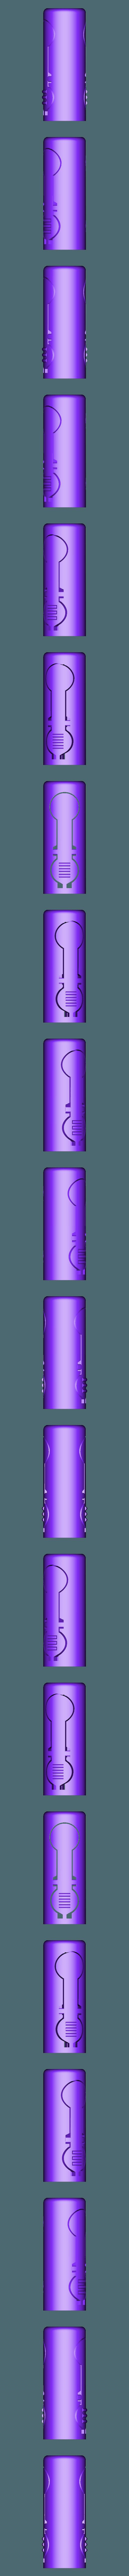 Cover.STL Download free STL file Phone Charger Plug Cover Child Proof Protector • 3D printer model, HoytDesign